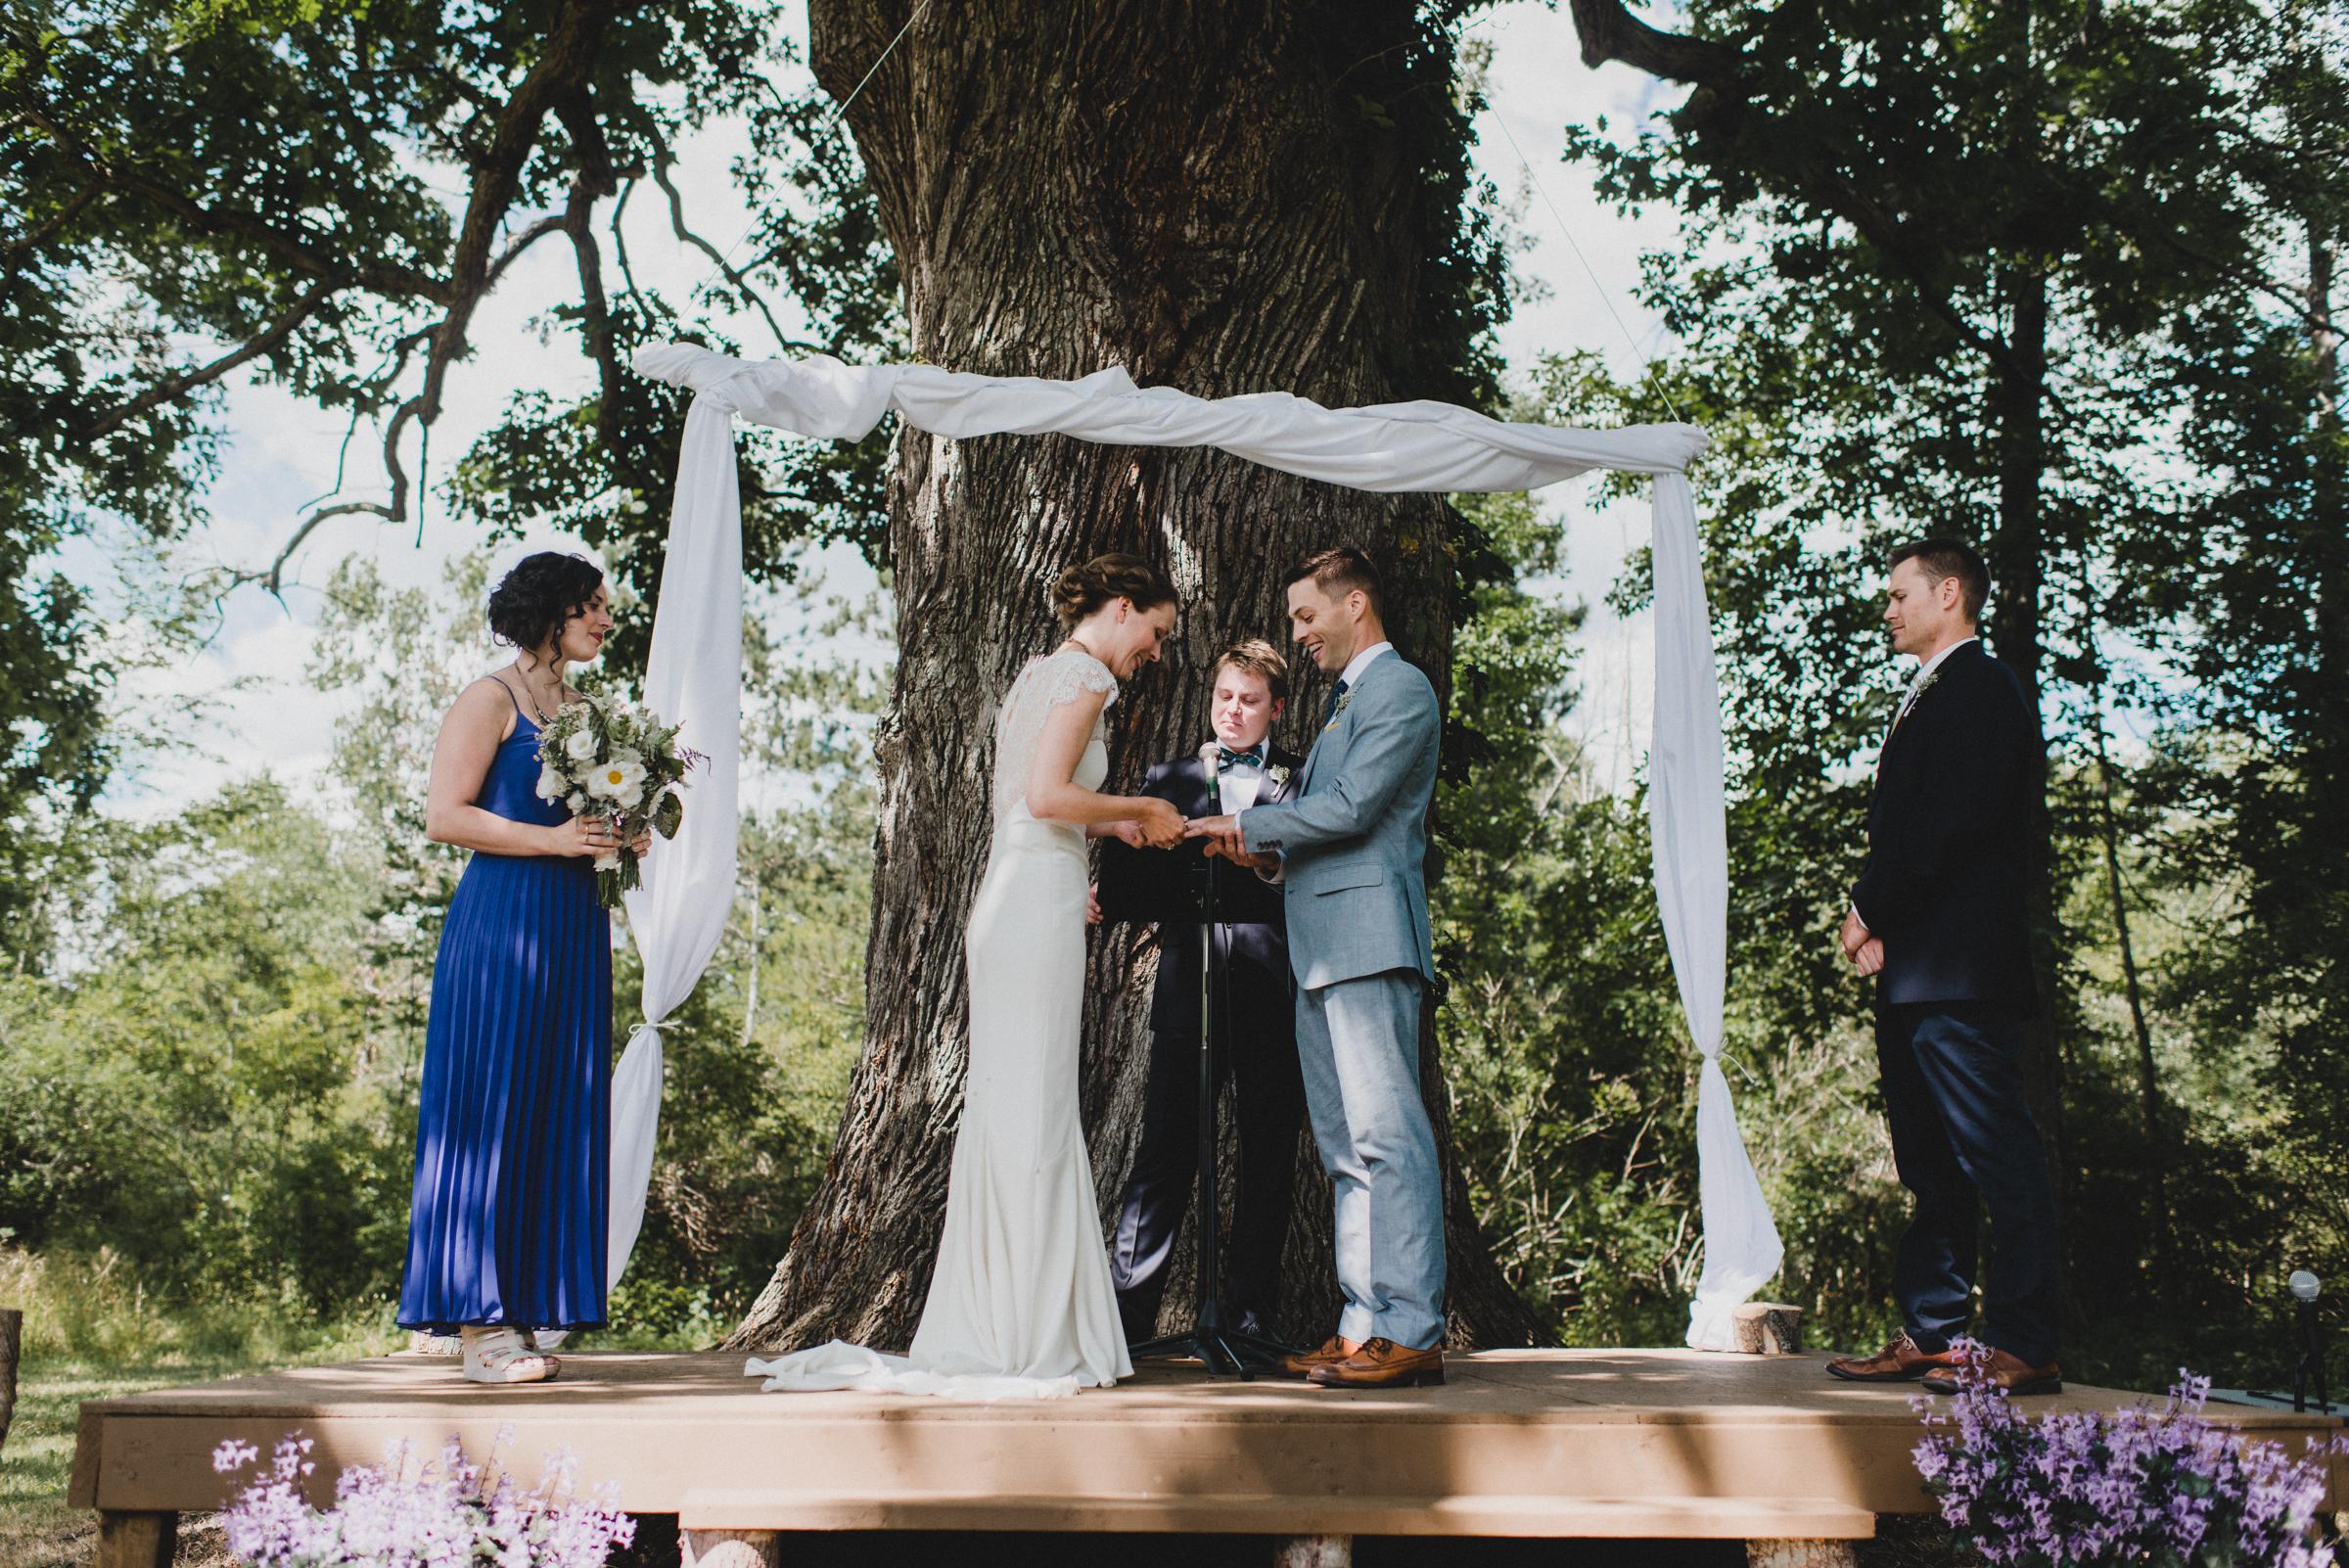 Intimate-Backyard-Farmhouse-Ohio-Wedding-Andi+Ben_Mallory+Justin-Photographers-166.JPG